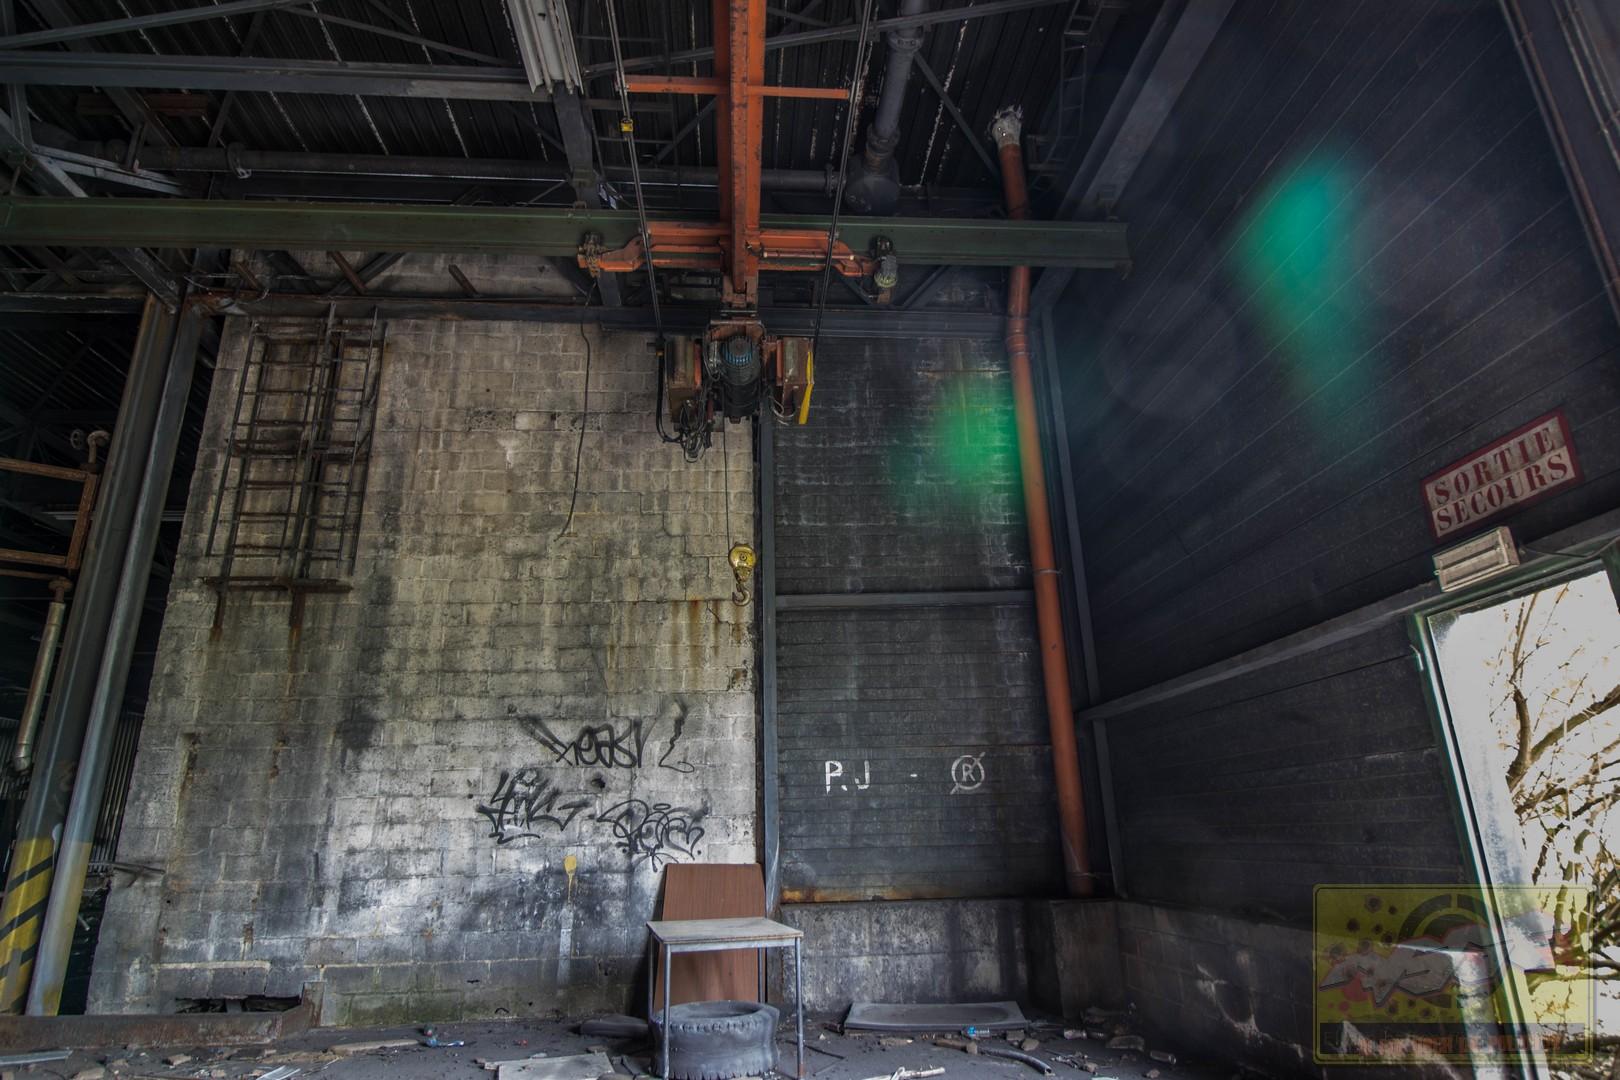 Bauxitfabrik-27.06.2020-3